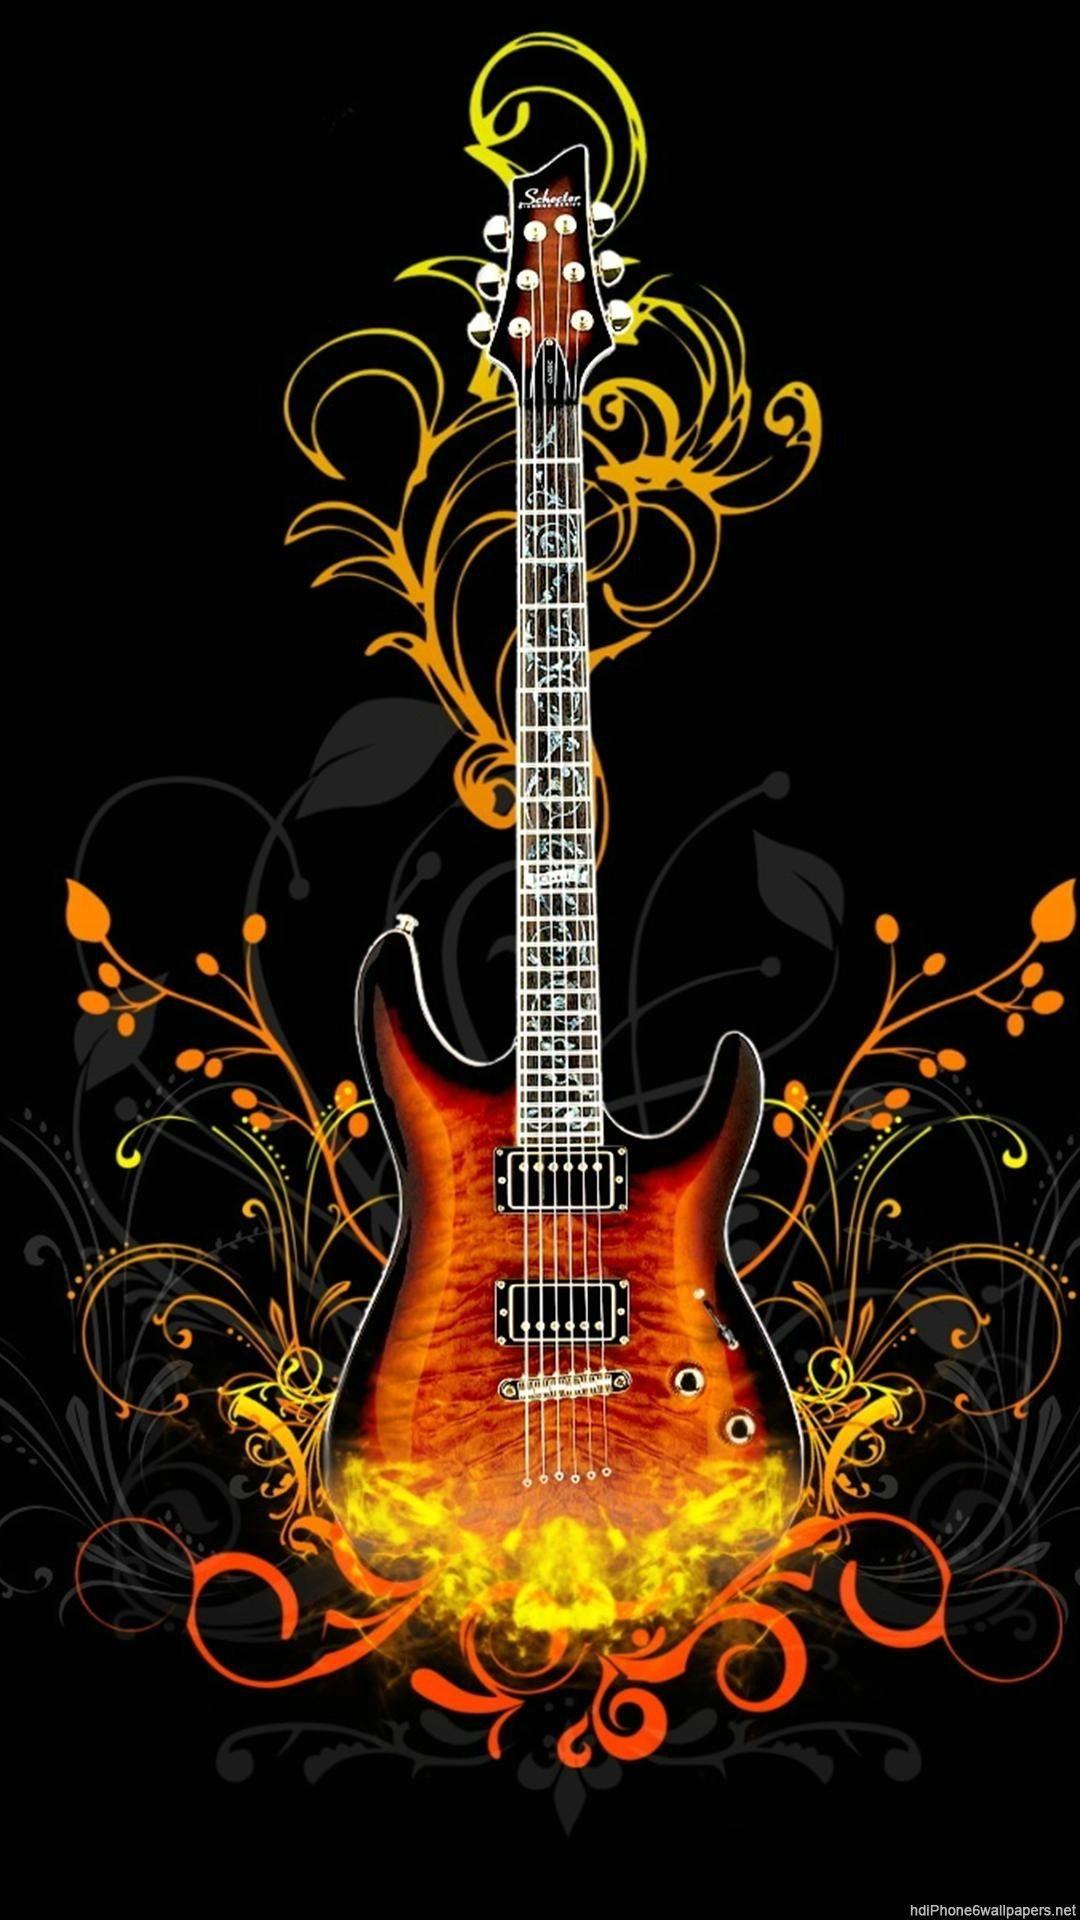 Res: 1080x1920, 3D Guitar Wallpaper iPhone - Best iPhone Wallpaper